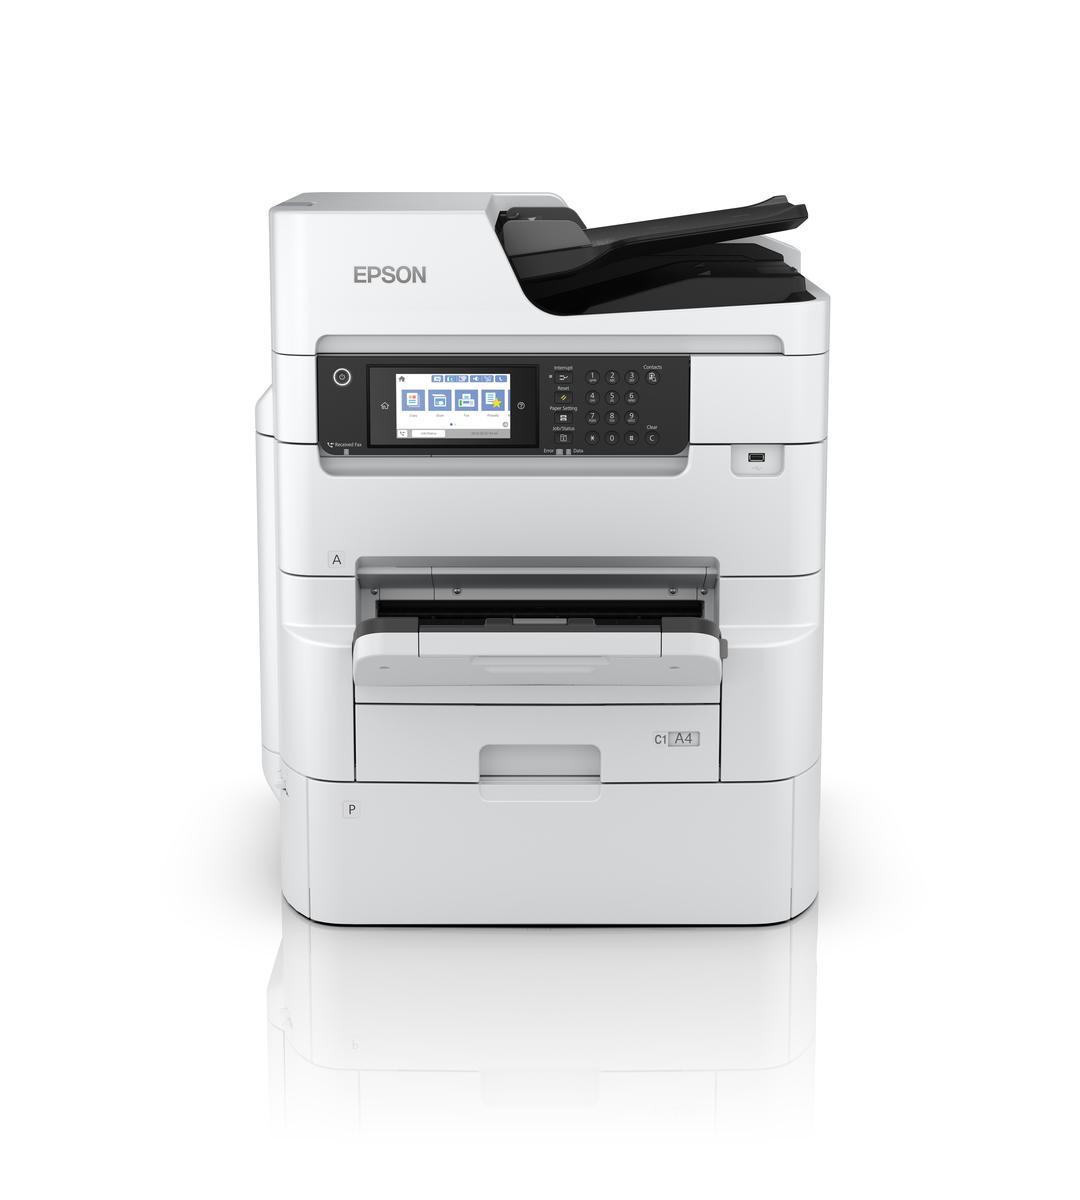 datche office machine epson printer and copier